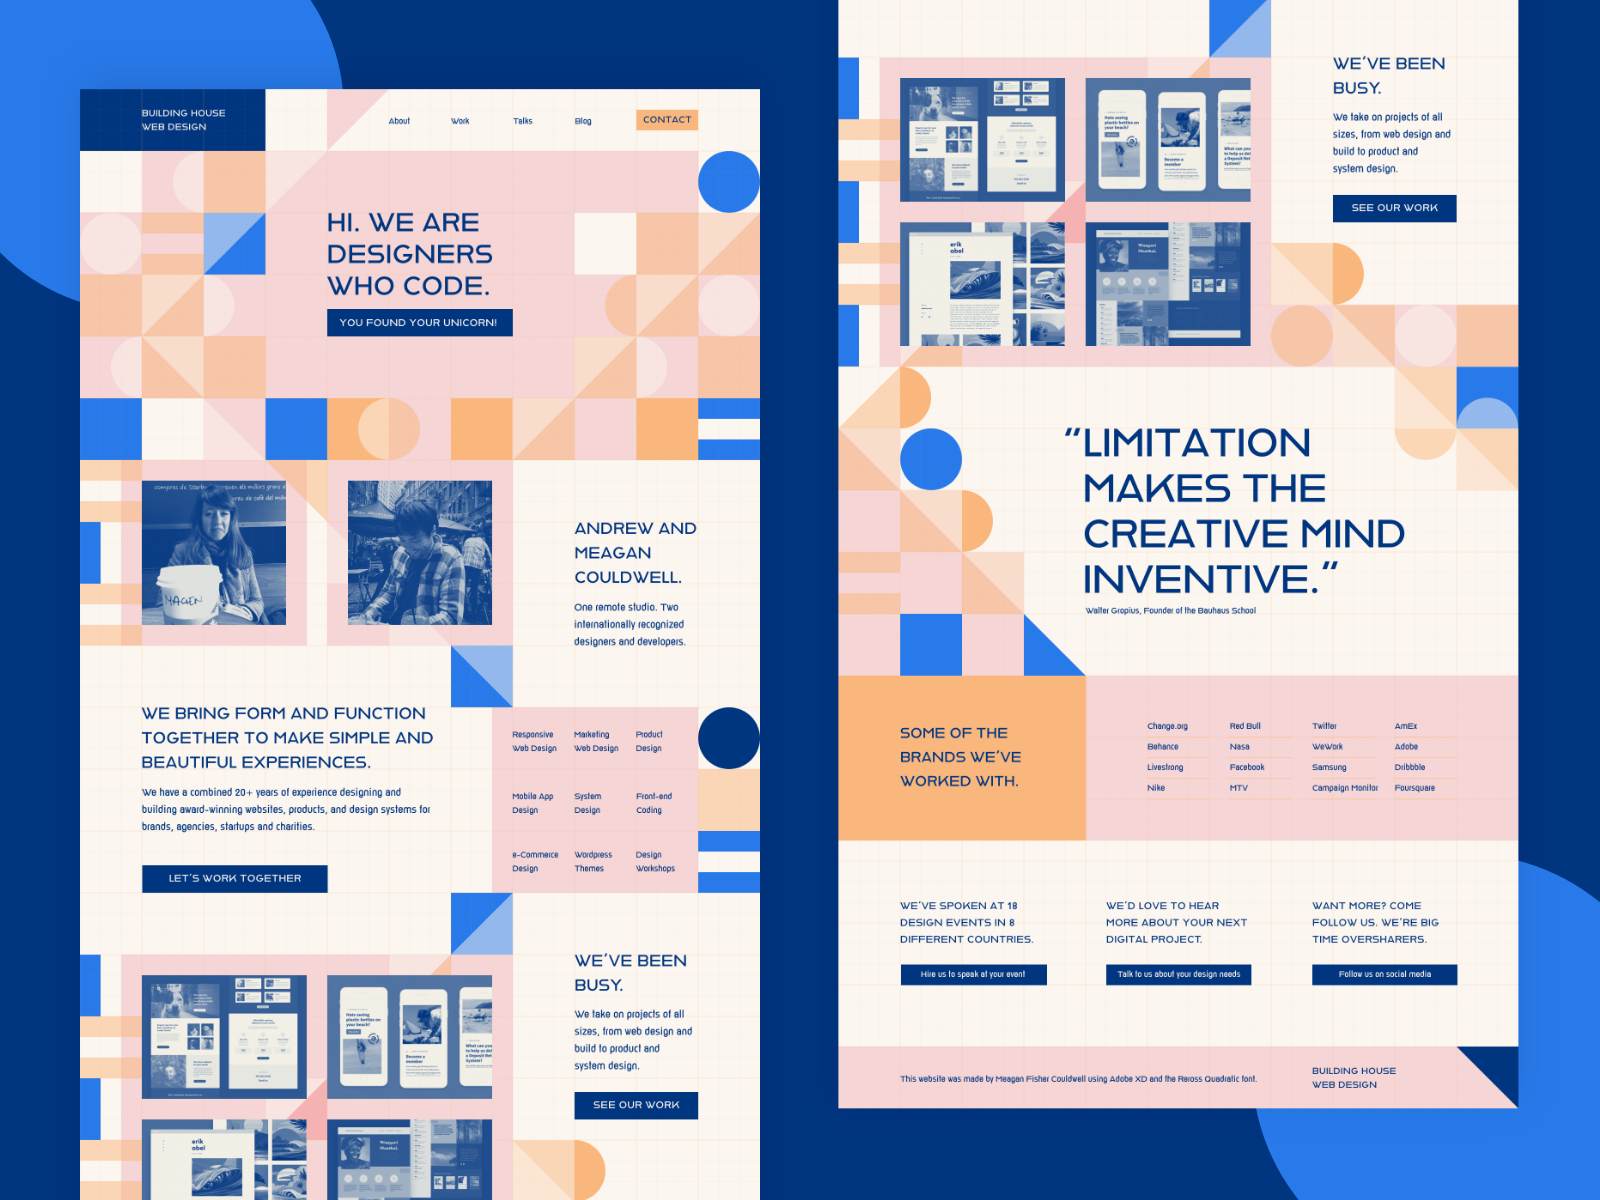 Adobe Hidden Treasures Design Portfolio Website Design Web Development Design Web App Design